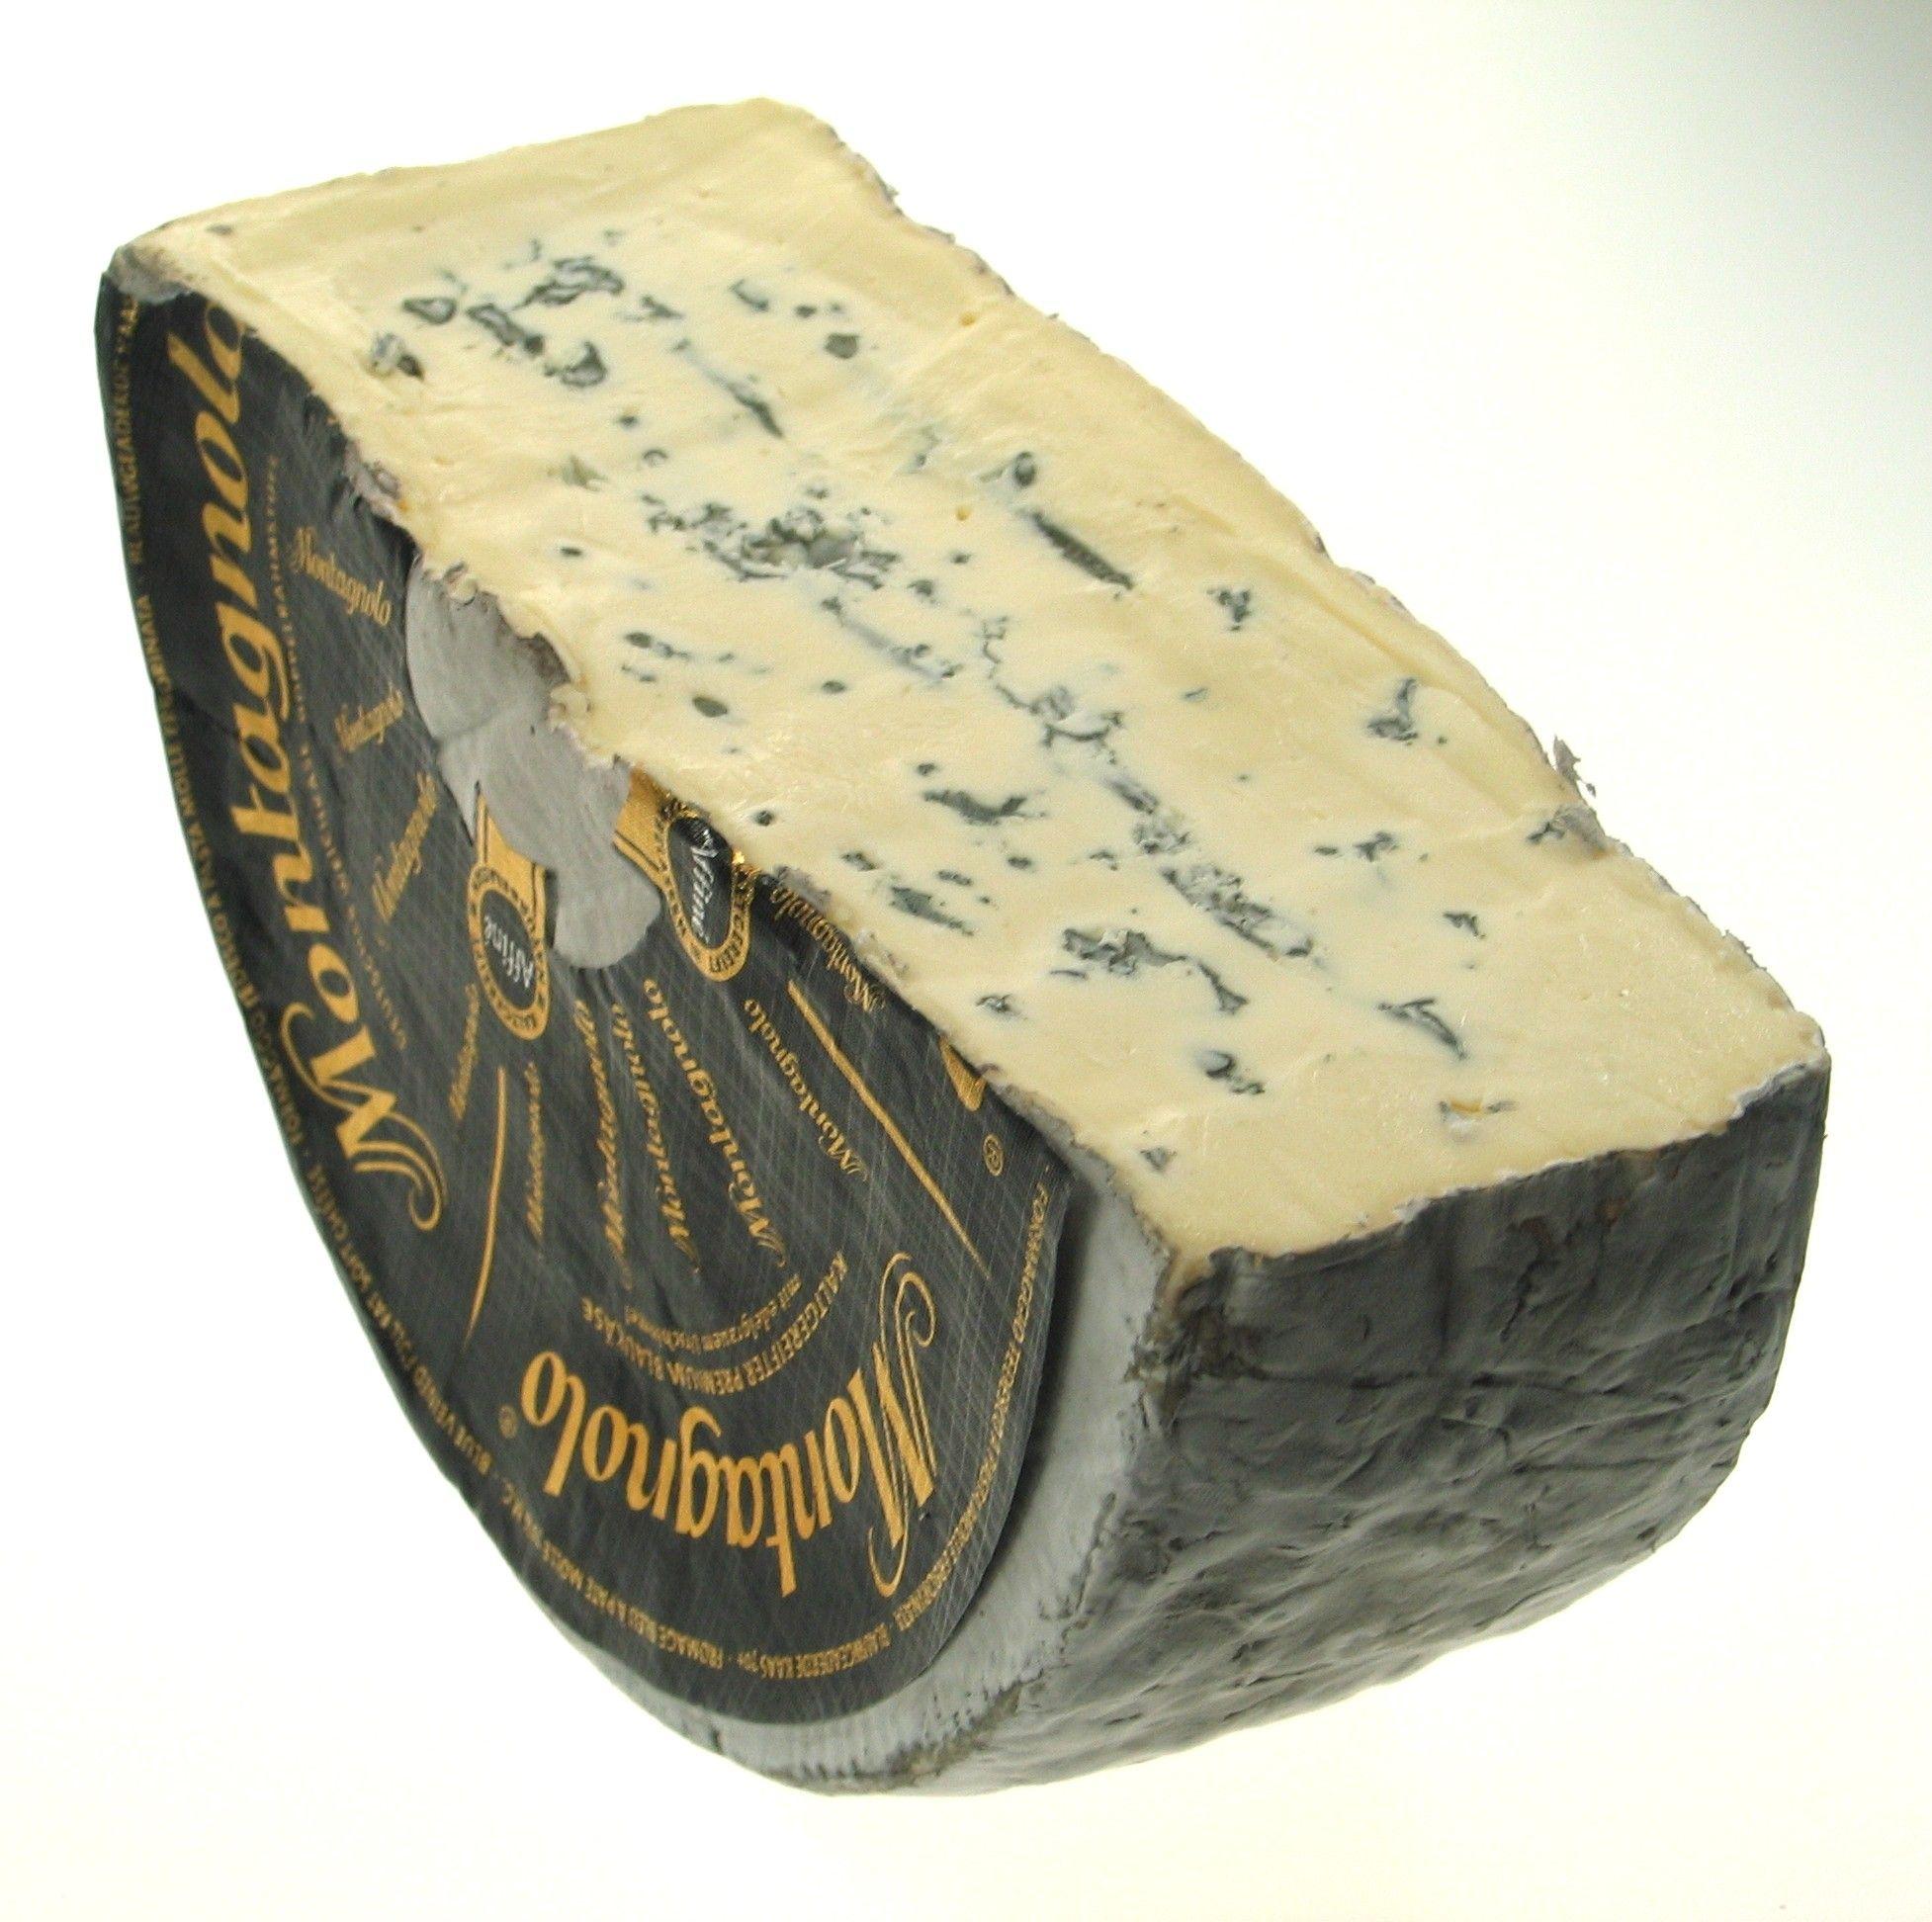 Montagnolo Affine монтаньело аффин мягкий сыр с серой и голубой плесенью корка сыра серого цвета мягкое эластичное тесто жирнос Soft Cheese Cheese Creme